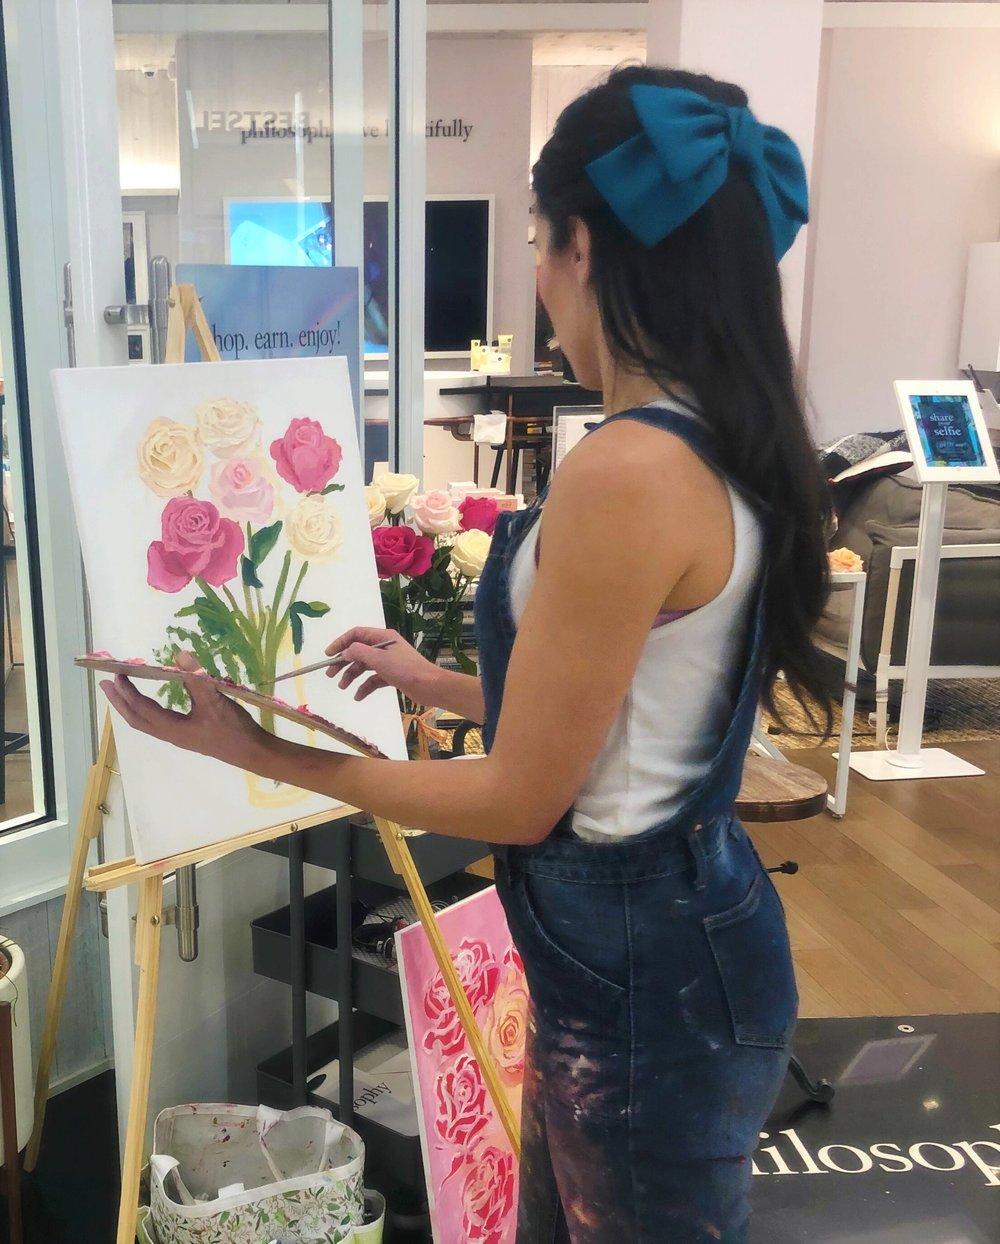 katrina-eugenia-philosophy-skincare-love-philosophy-amazing-grace-amazing-grace-ballet-rose-live-painting-oil-painting16.JPG